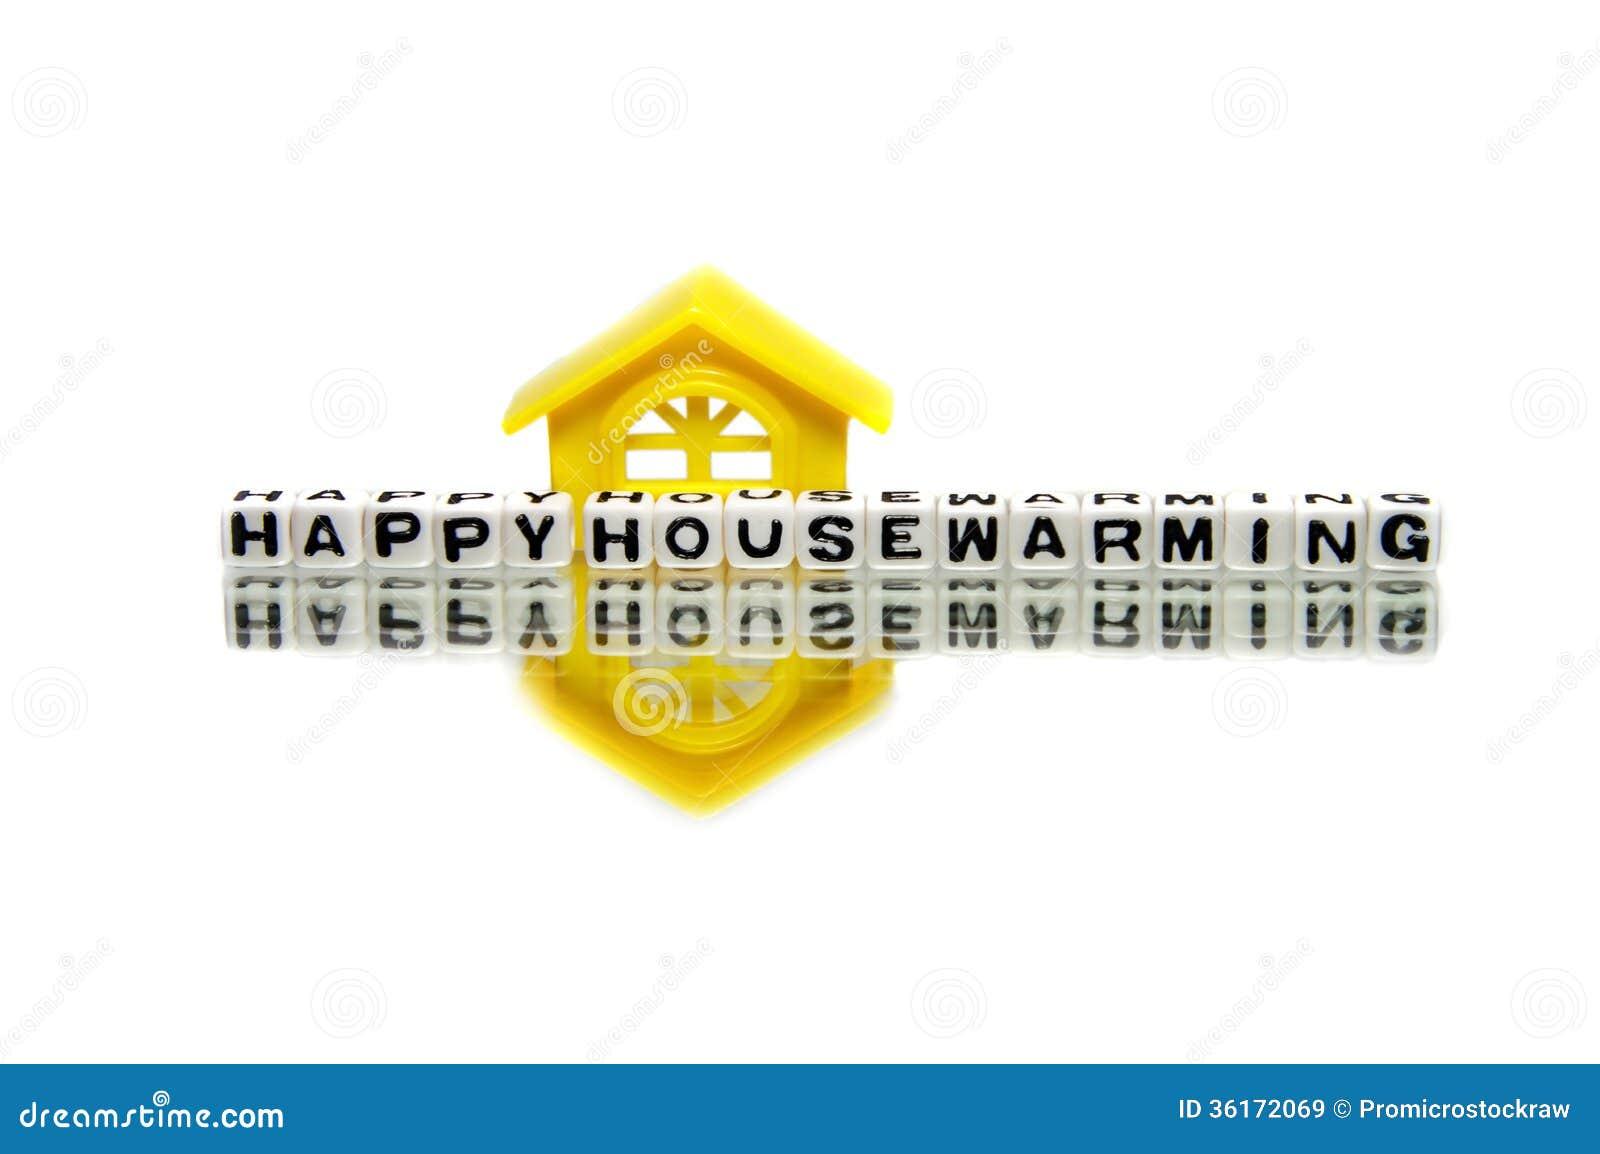 clipart housewarming - photo #14